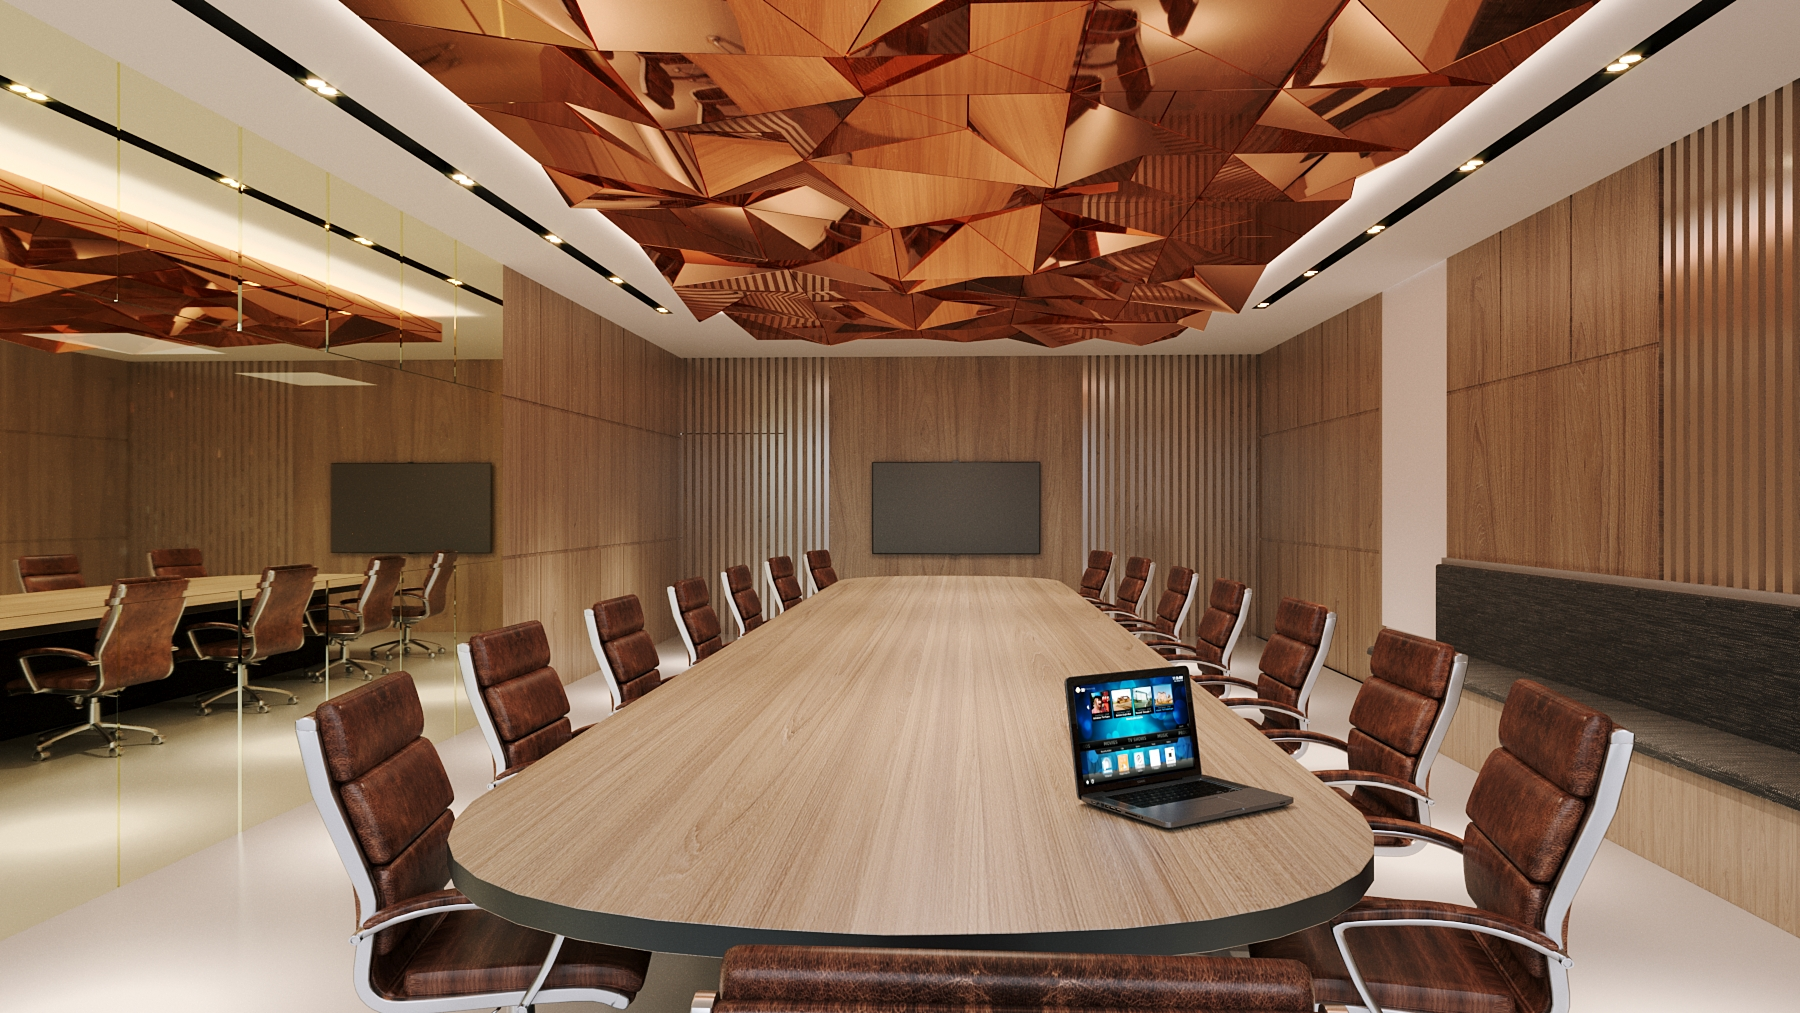 Ccnference Room Option 3